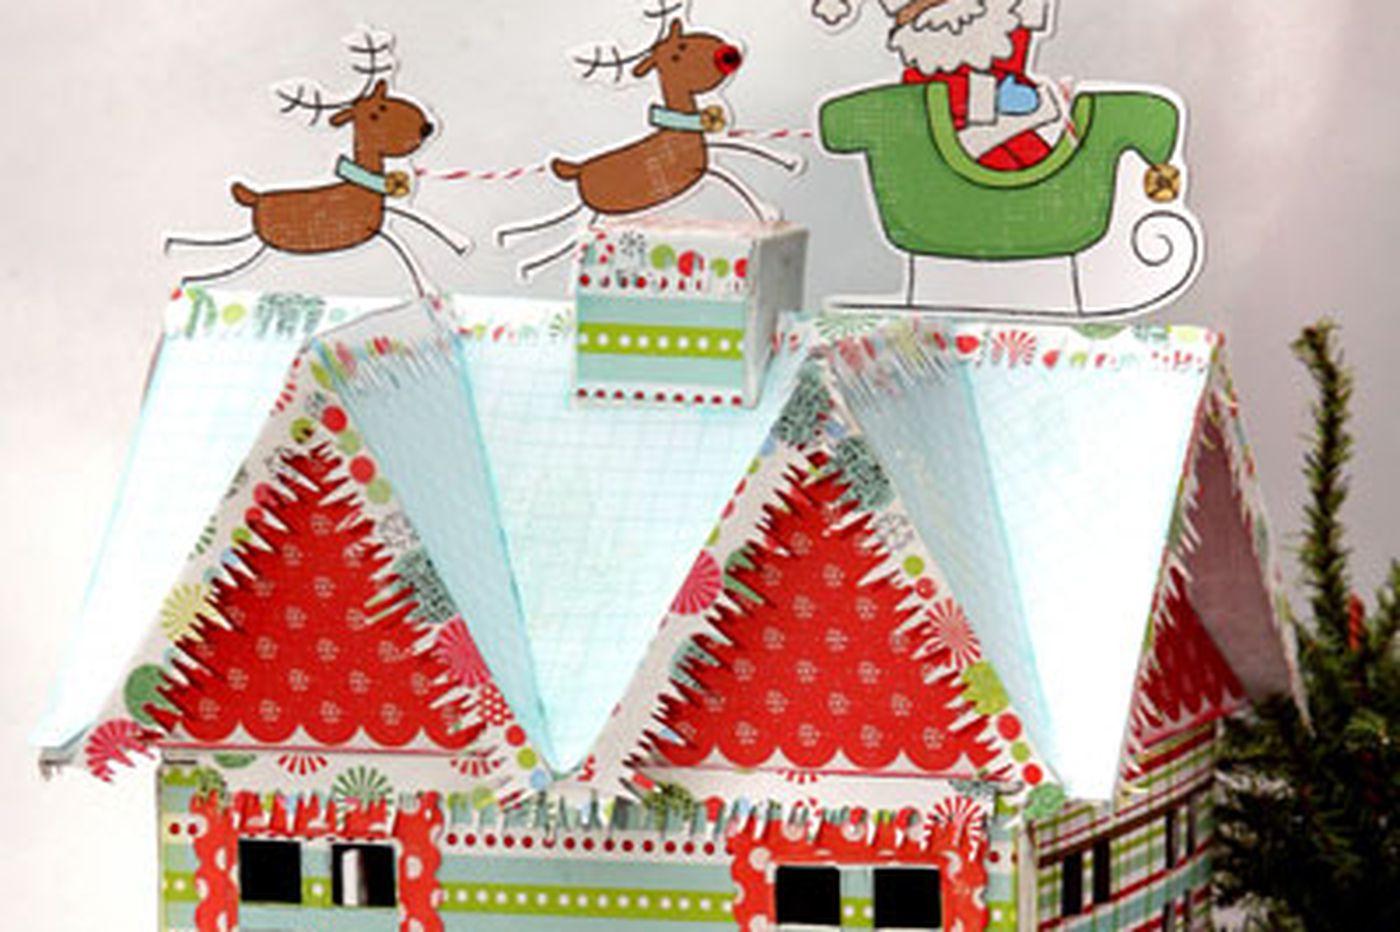 Glittery winter house brightens the season